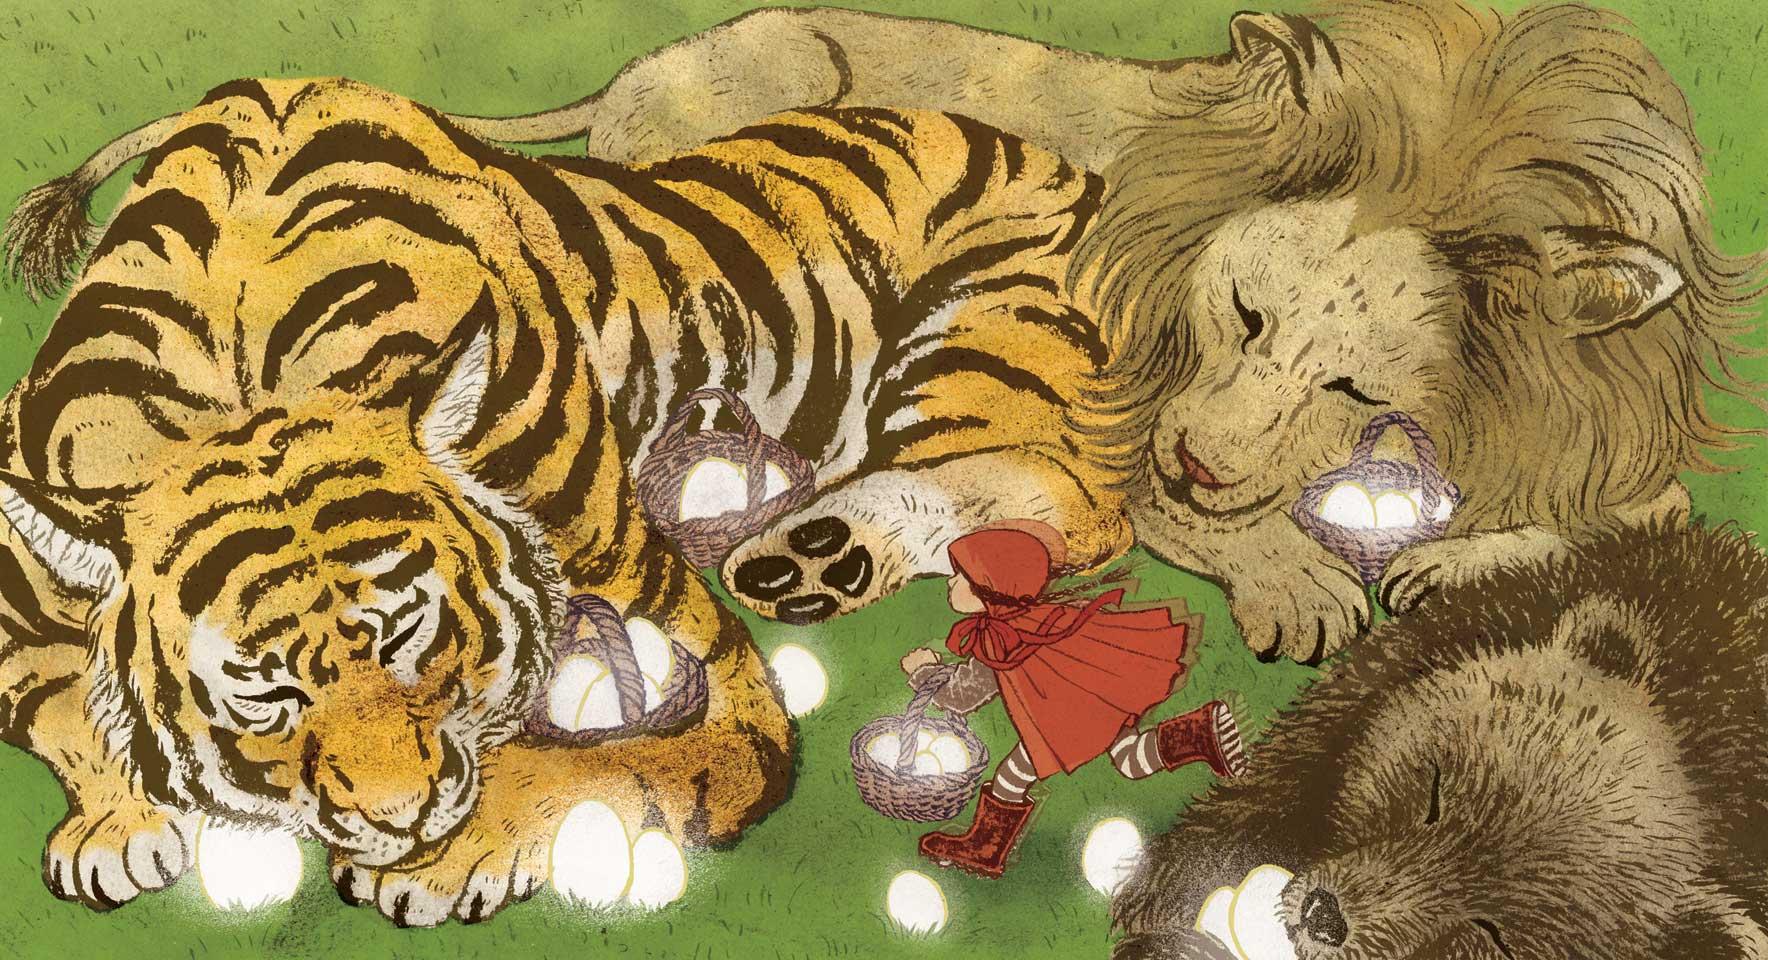 https://i0.wp.com/yukoart.com/wp-content/uploads/2012/07/tiger_lion_bear.jpg